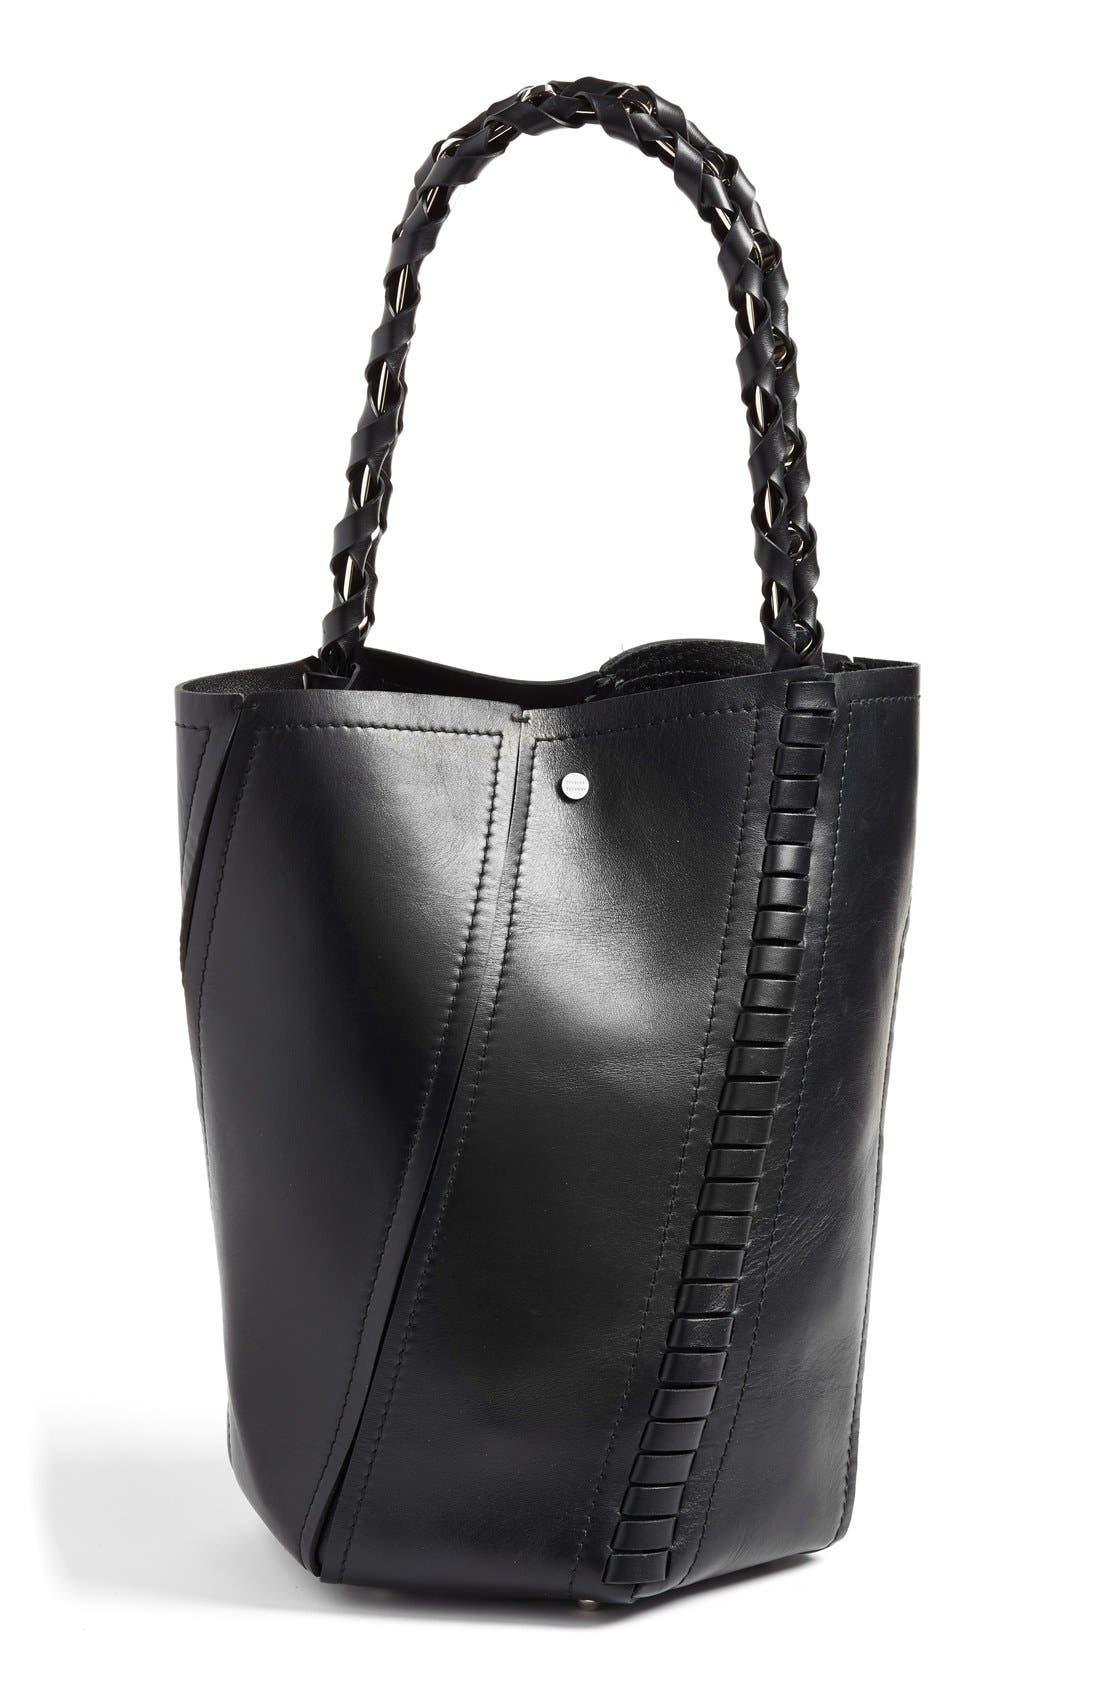 PROENZA SCHOULER, 'Medium Hex' Whipstitch Leather Bucket Bag, Alternate thumbnail 2, color, BLACK